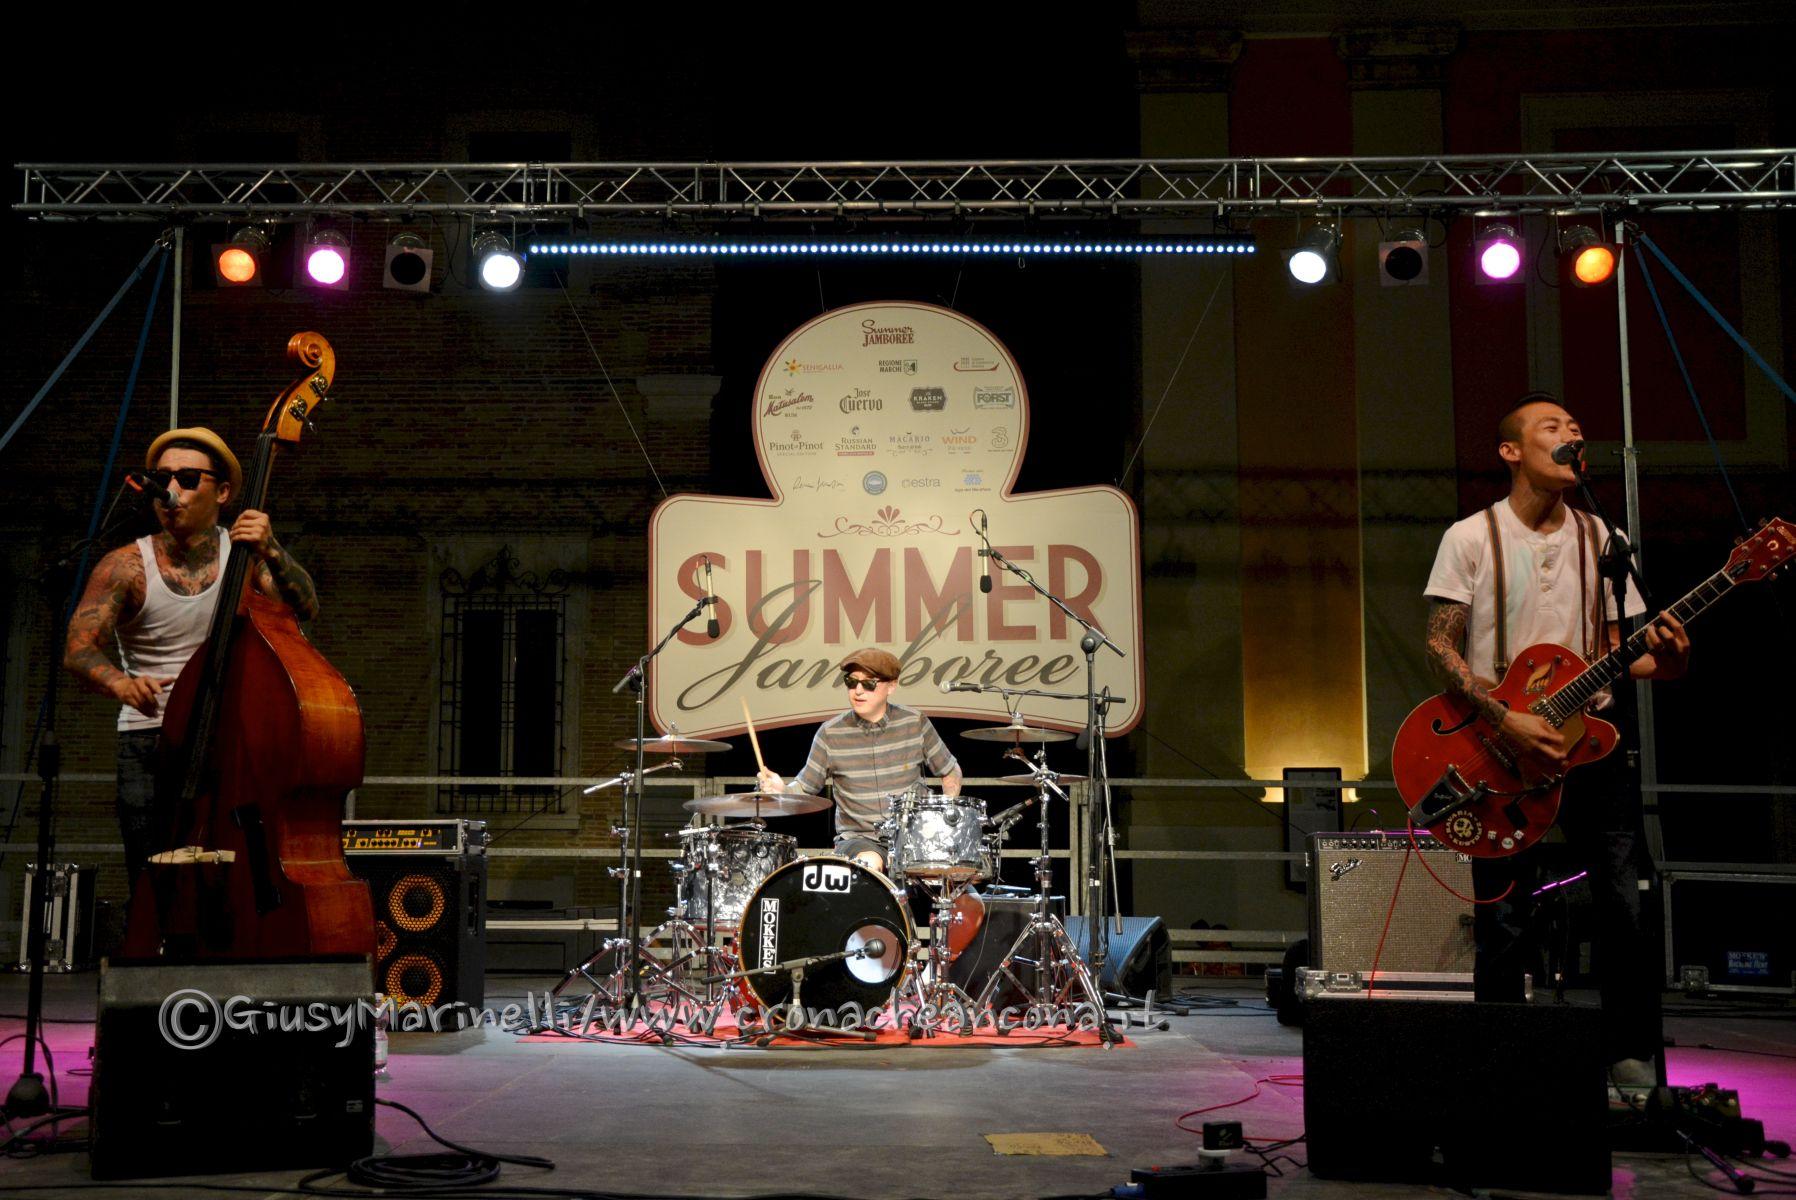 Summer_Jamboree-1-DSC_0191